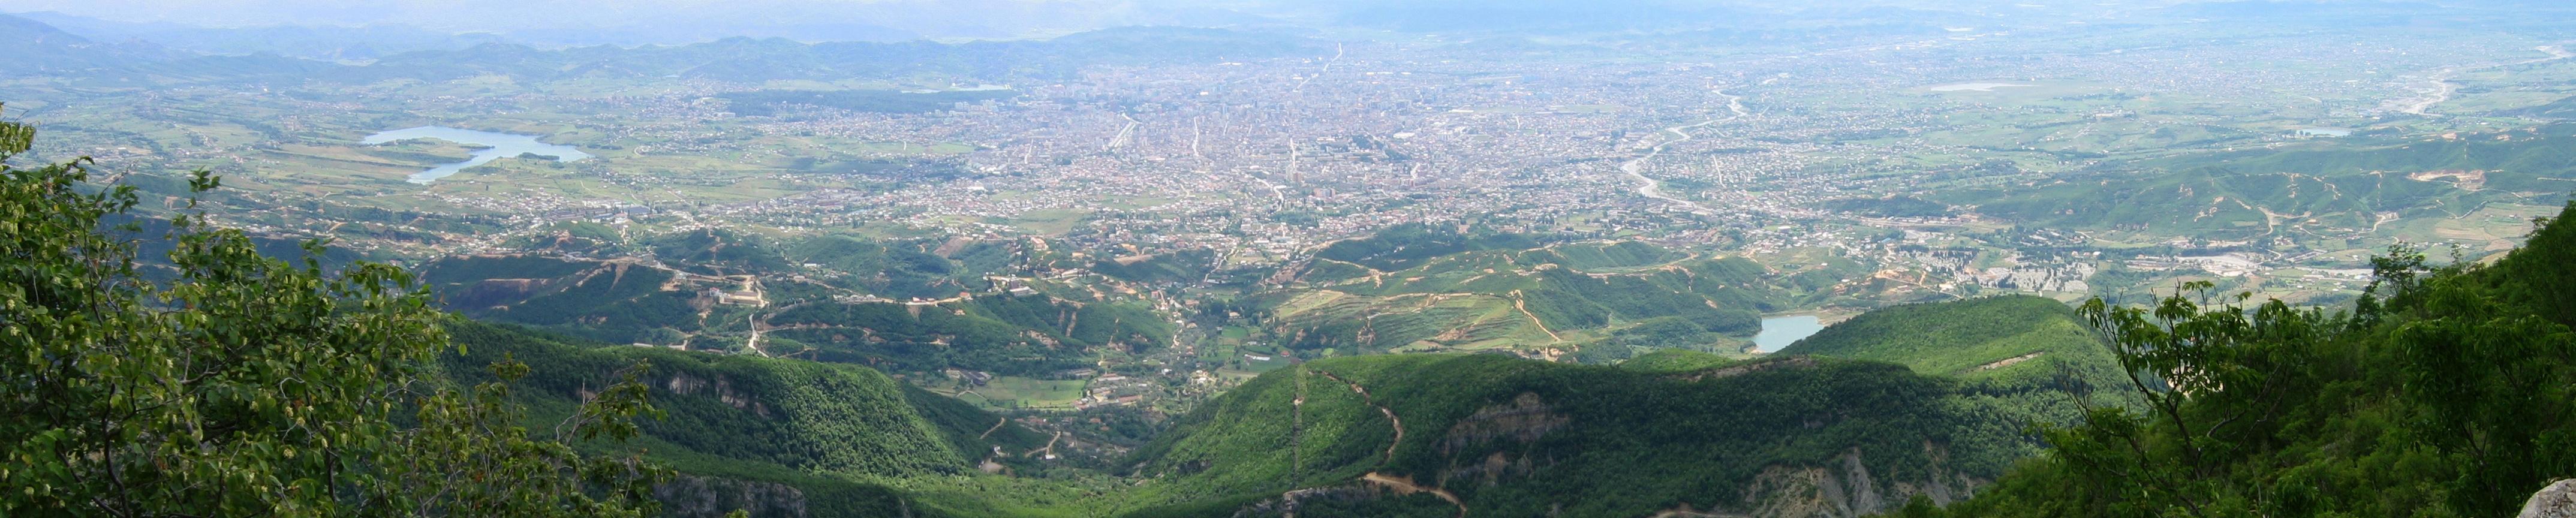 Mount Dajti